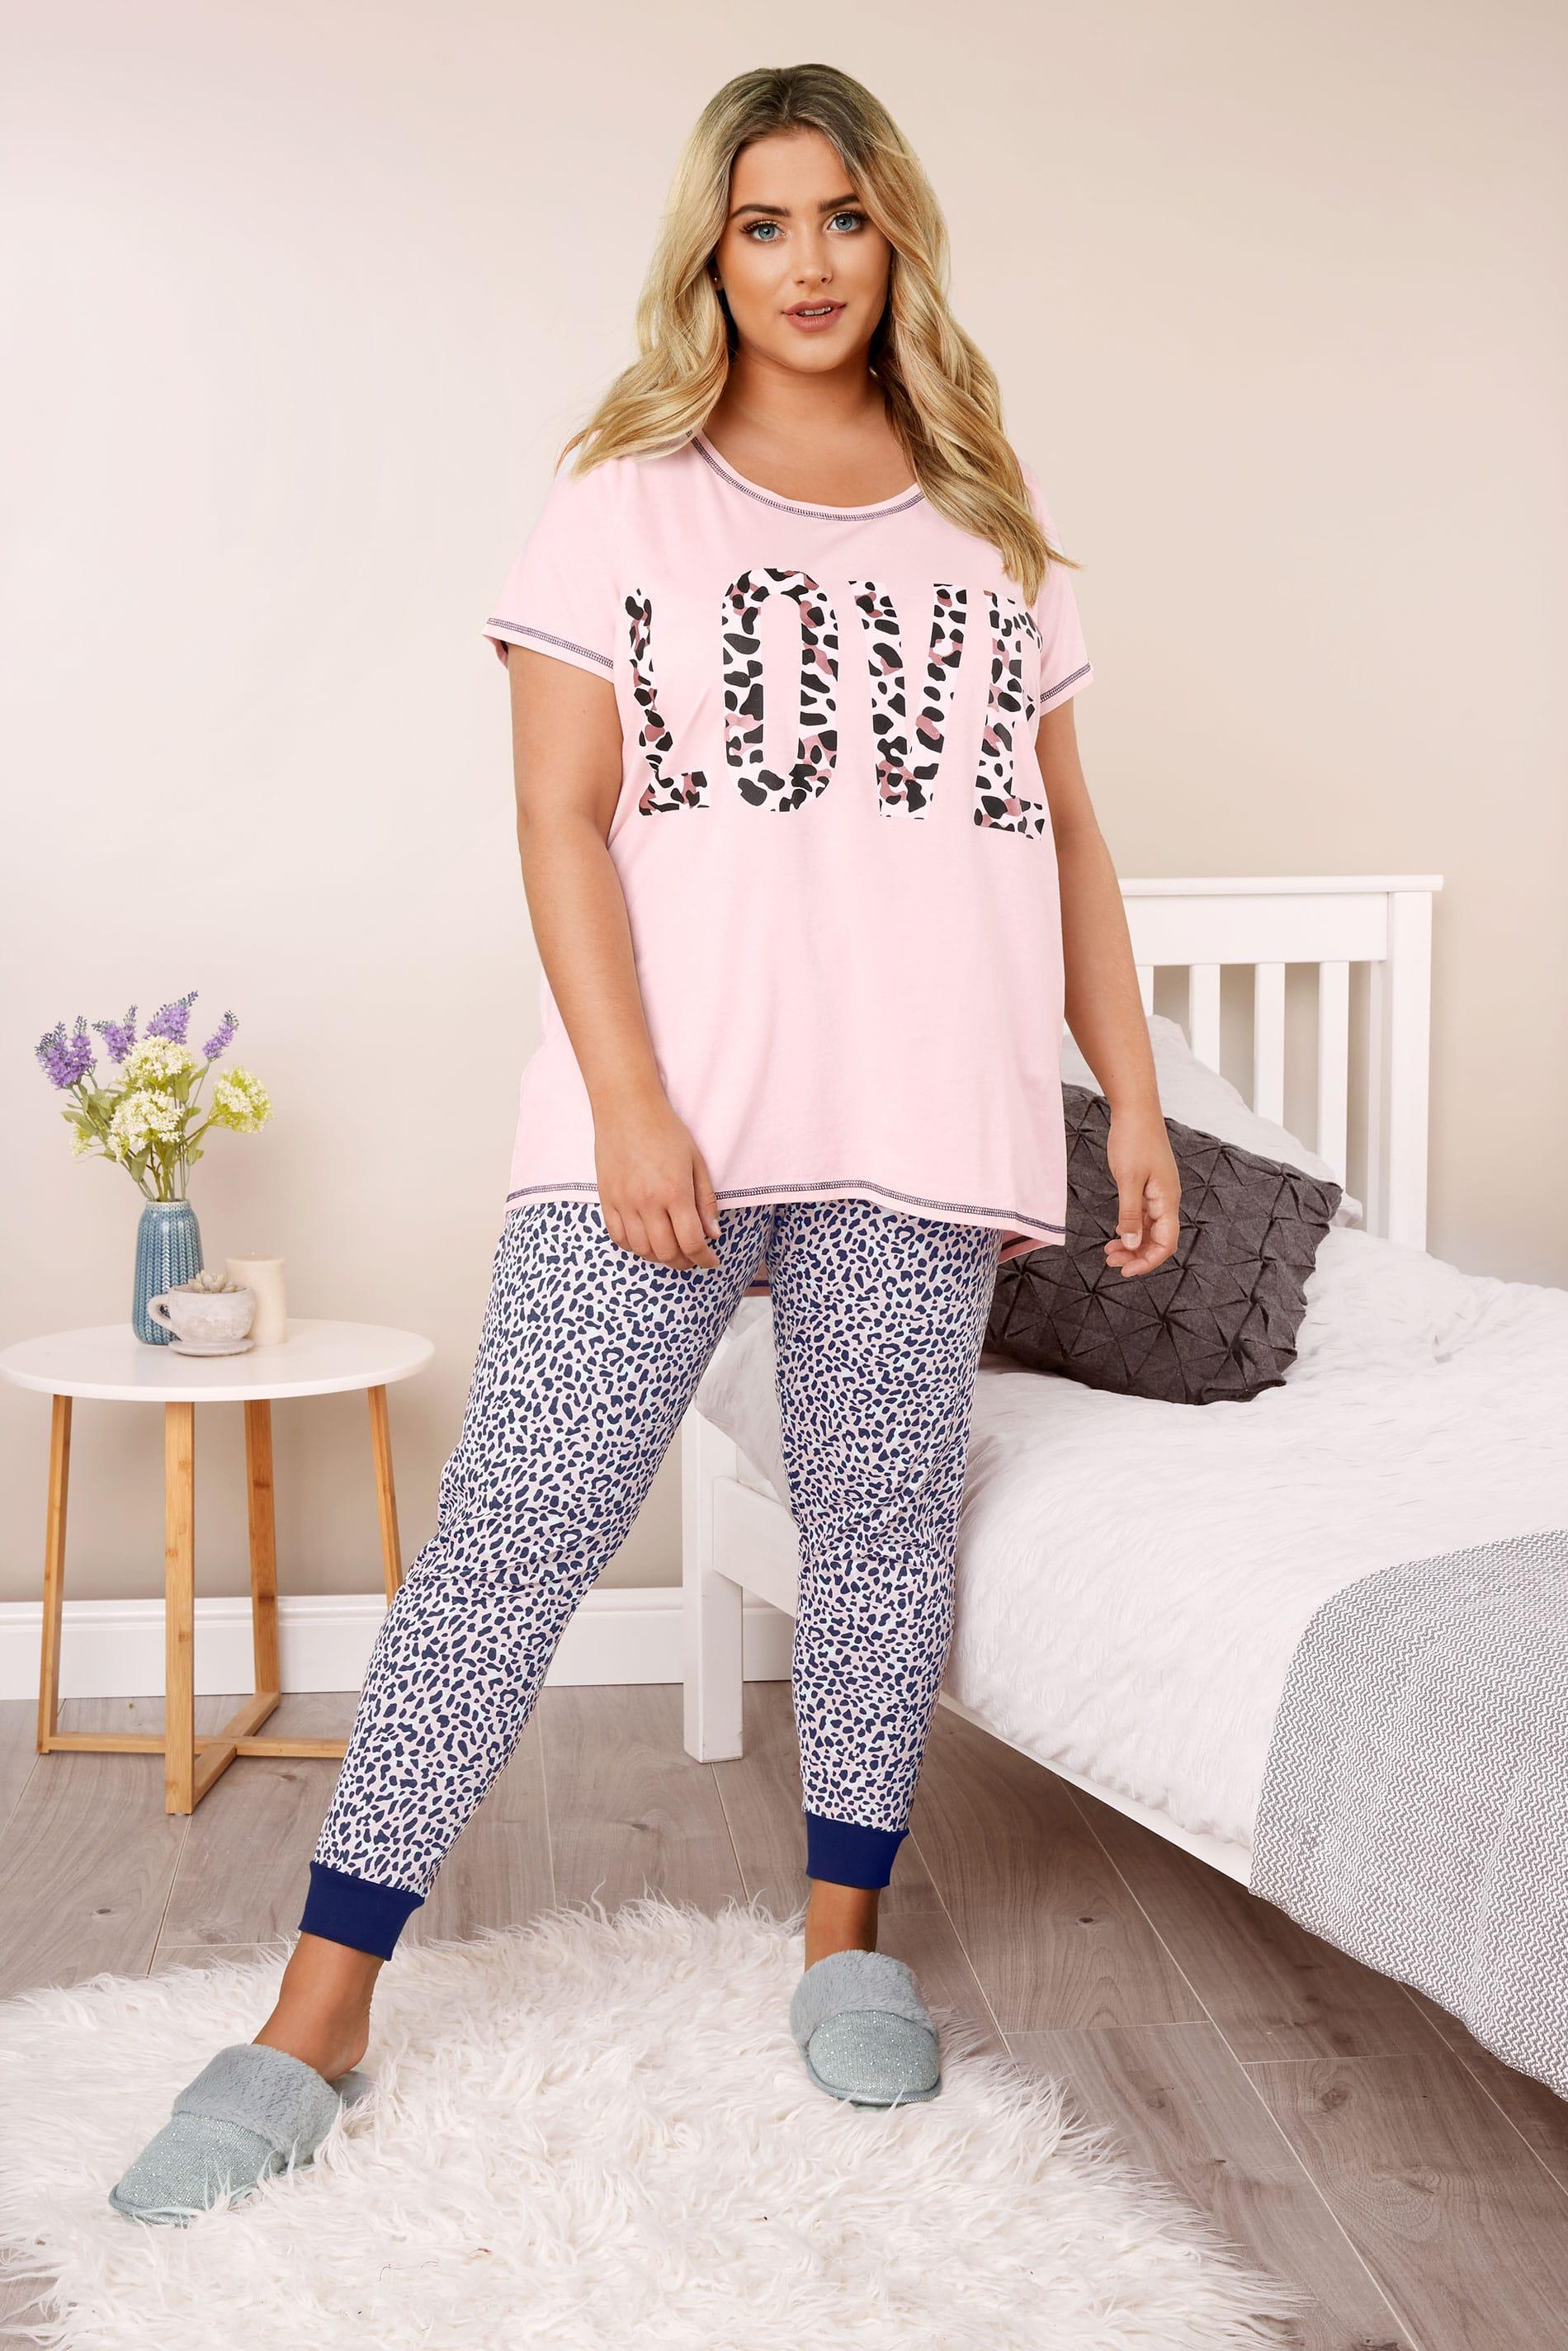 Pink Leopard Print 'Love' Slogan Pyjama Set